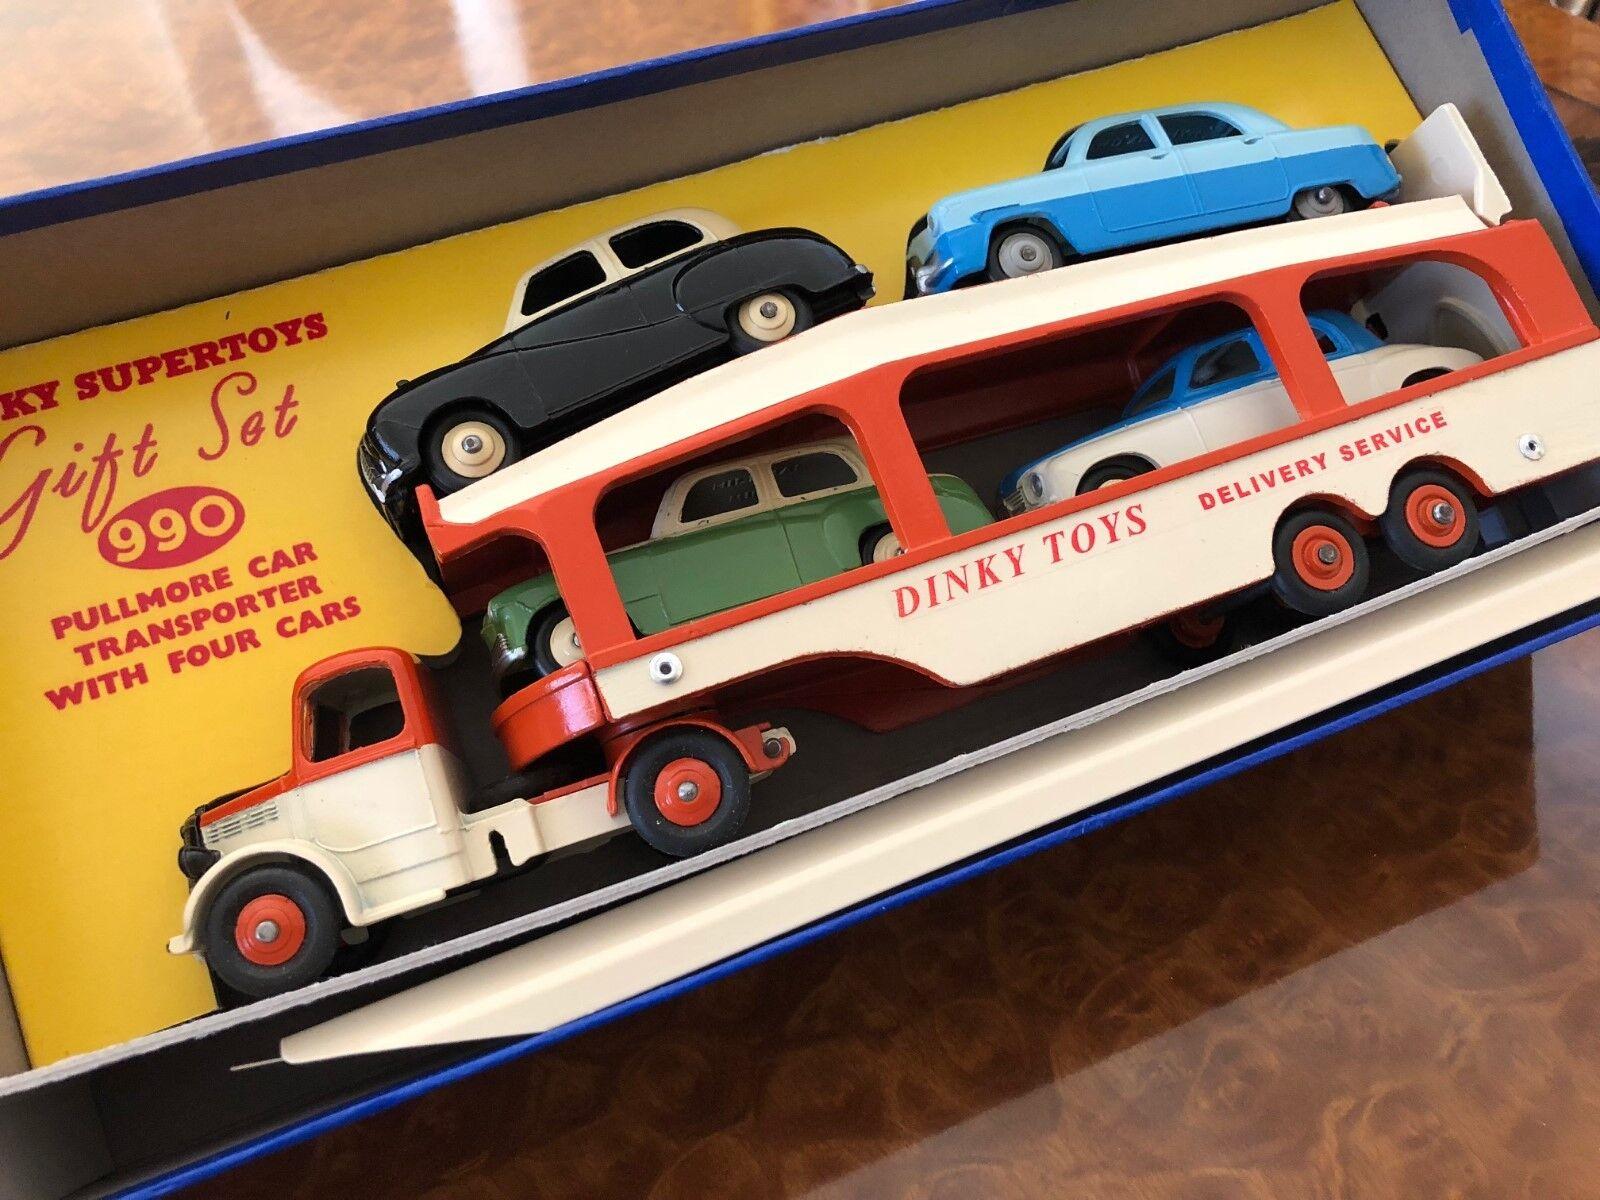 Vintage Dinky Supertoys Set de Regalo Pullmore Portavehículos + 4 Coches 990-M